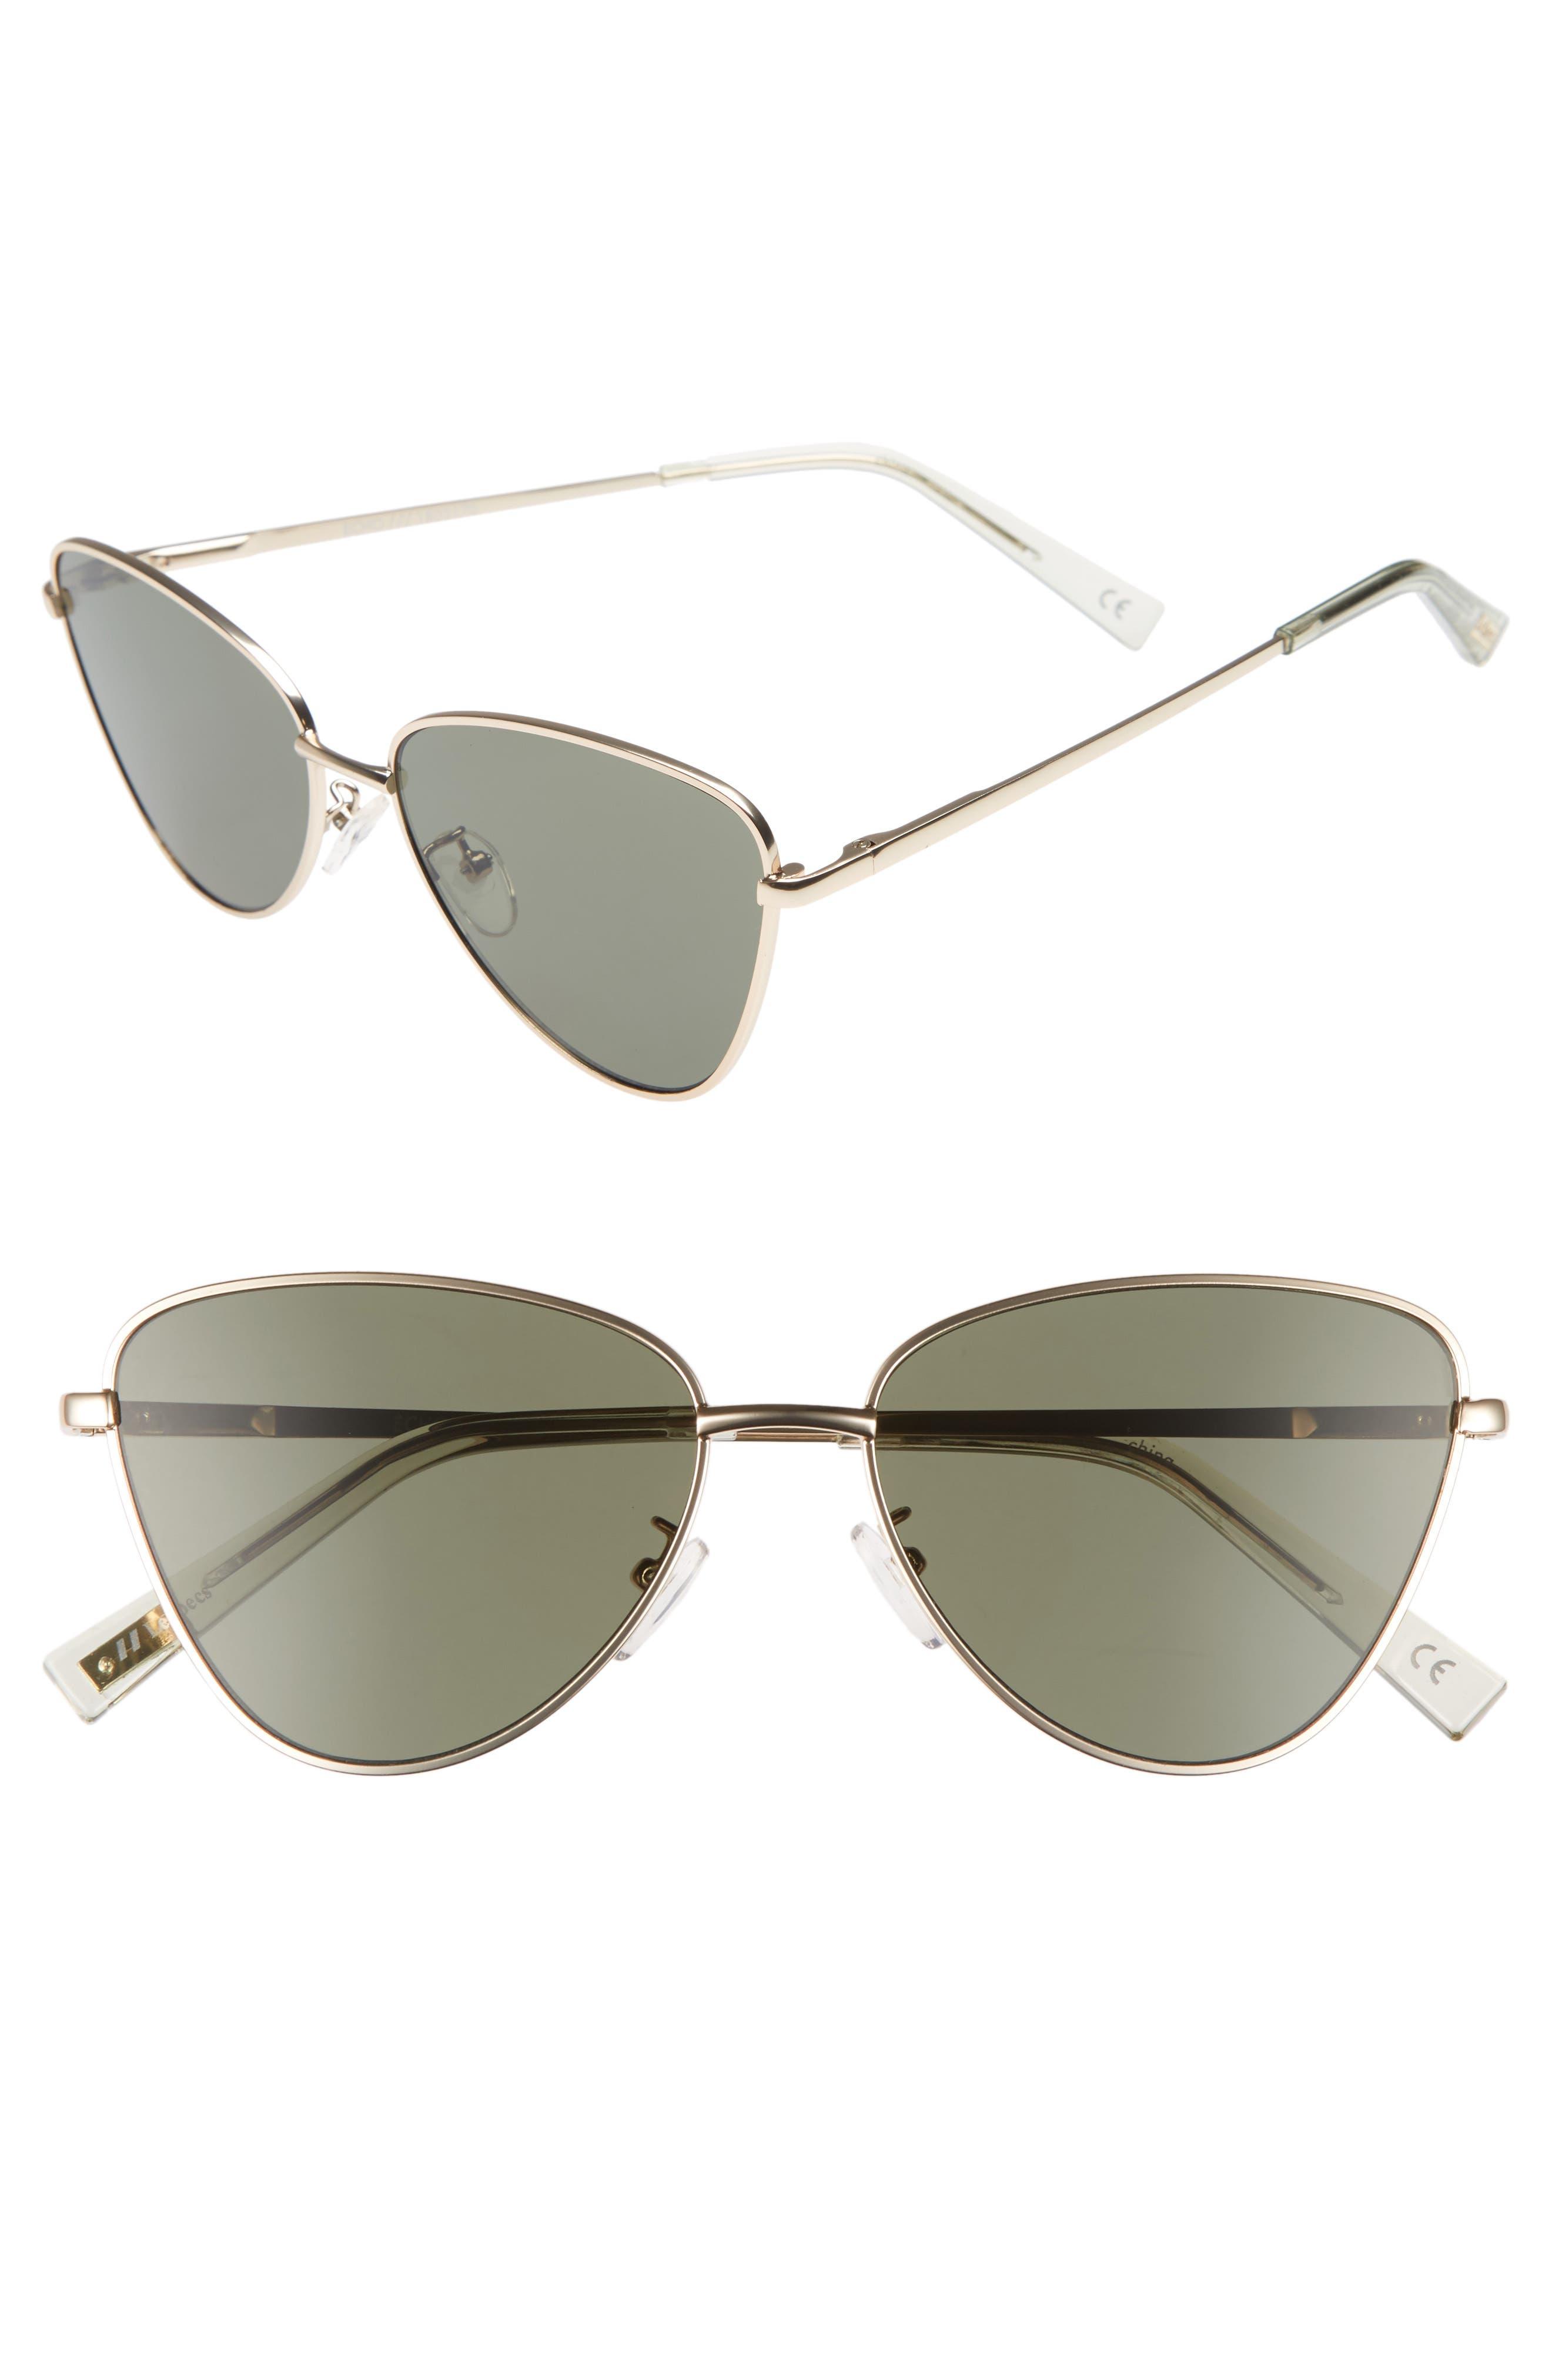 Le Specs Echo 50Mm Butterfly Sunglasses - Matte Gold